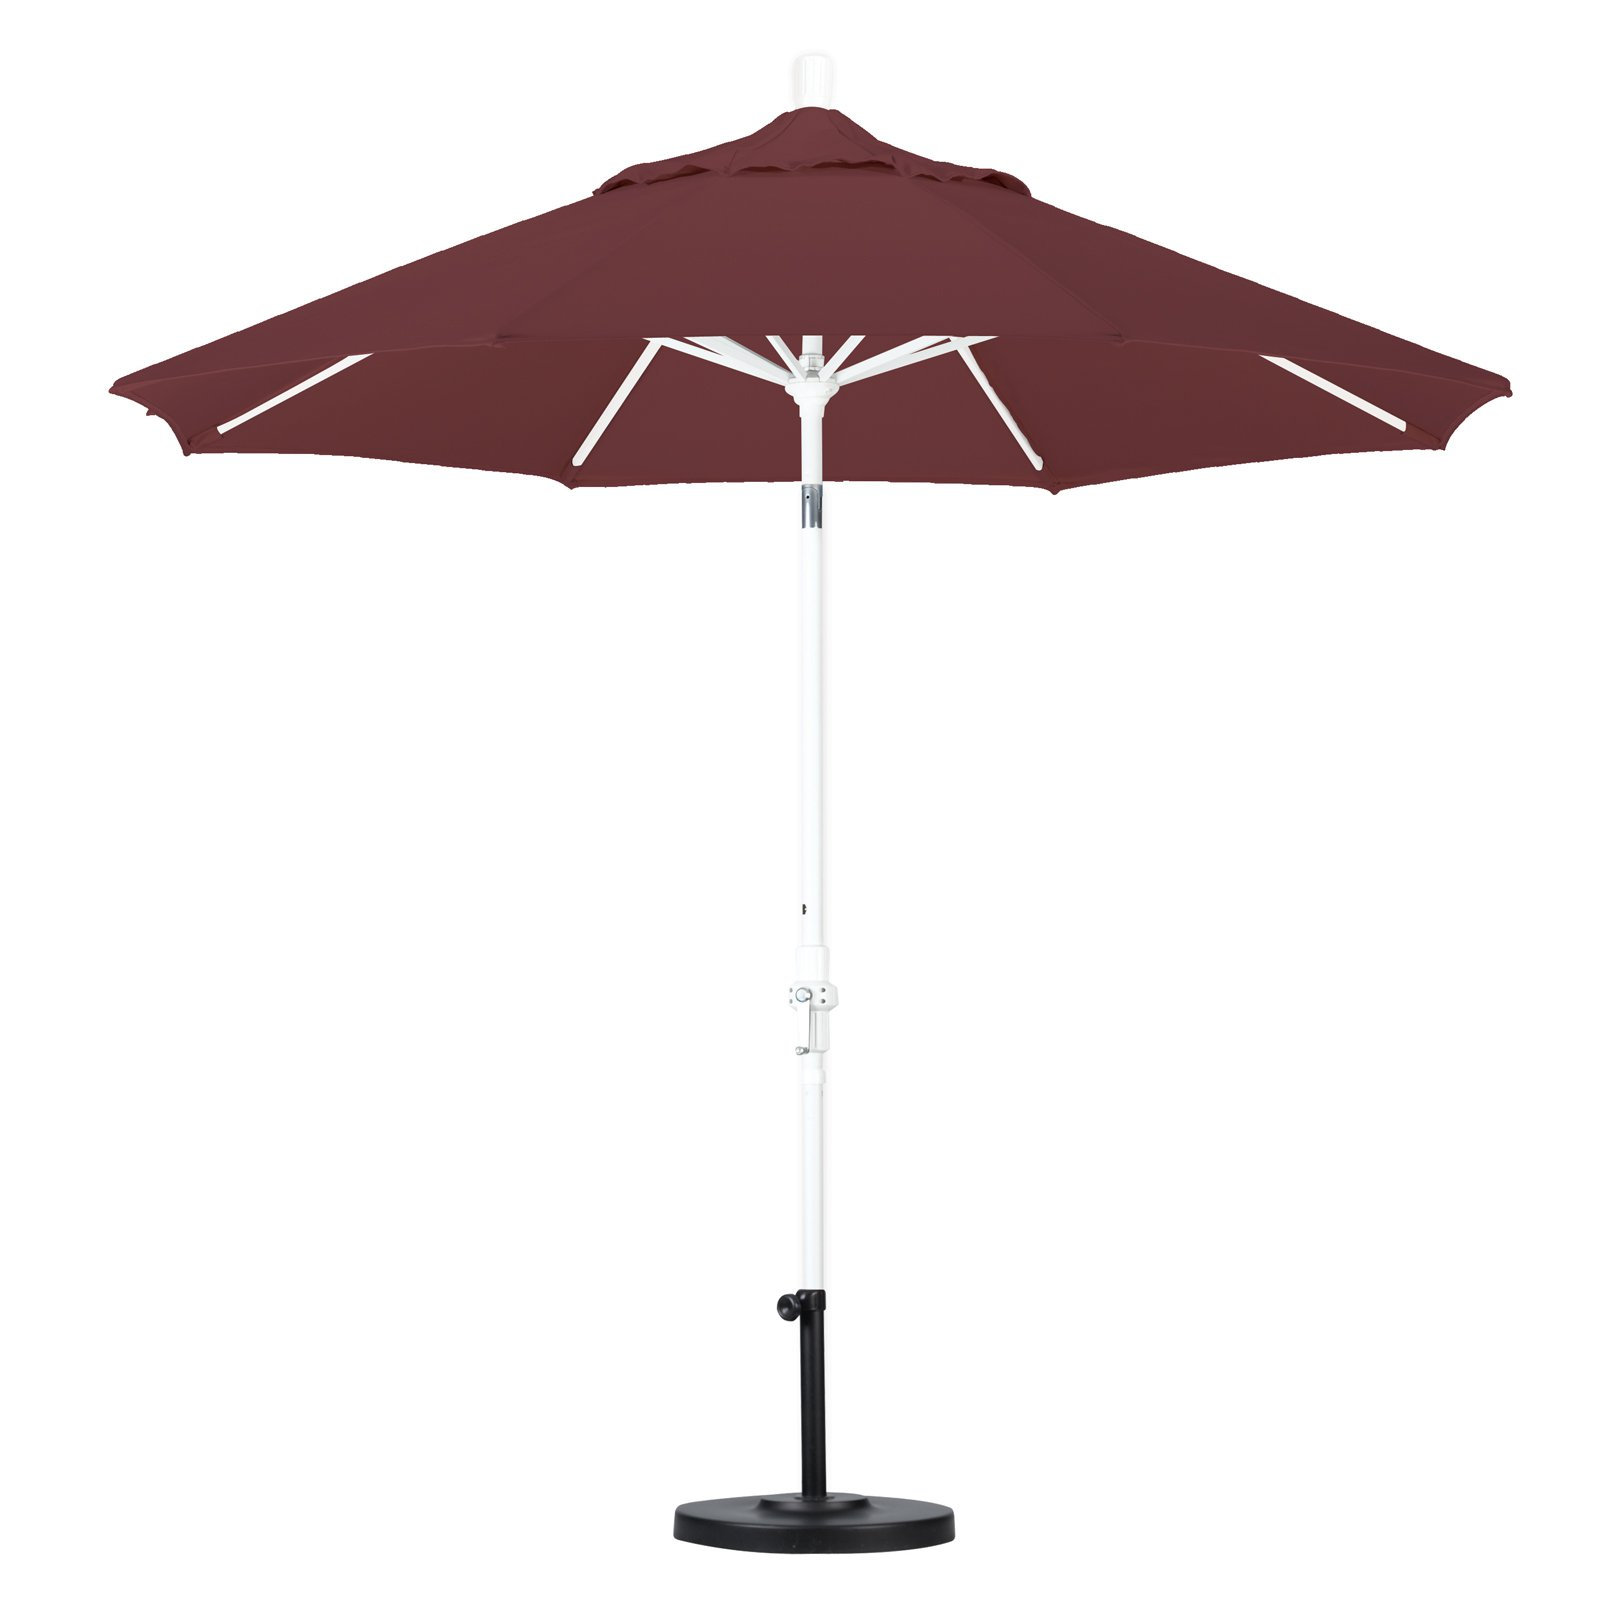 California Umbrella 9' Aluminum Market Umbrella Collar Tilt, Bronze, Olefin, Navy White Stripe